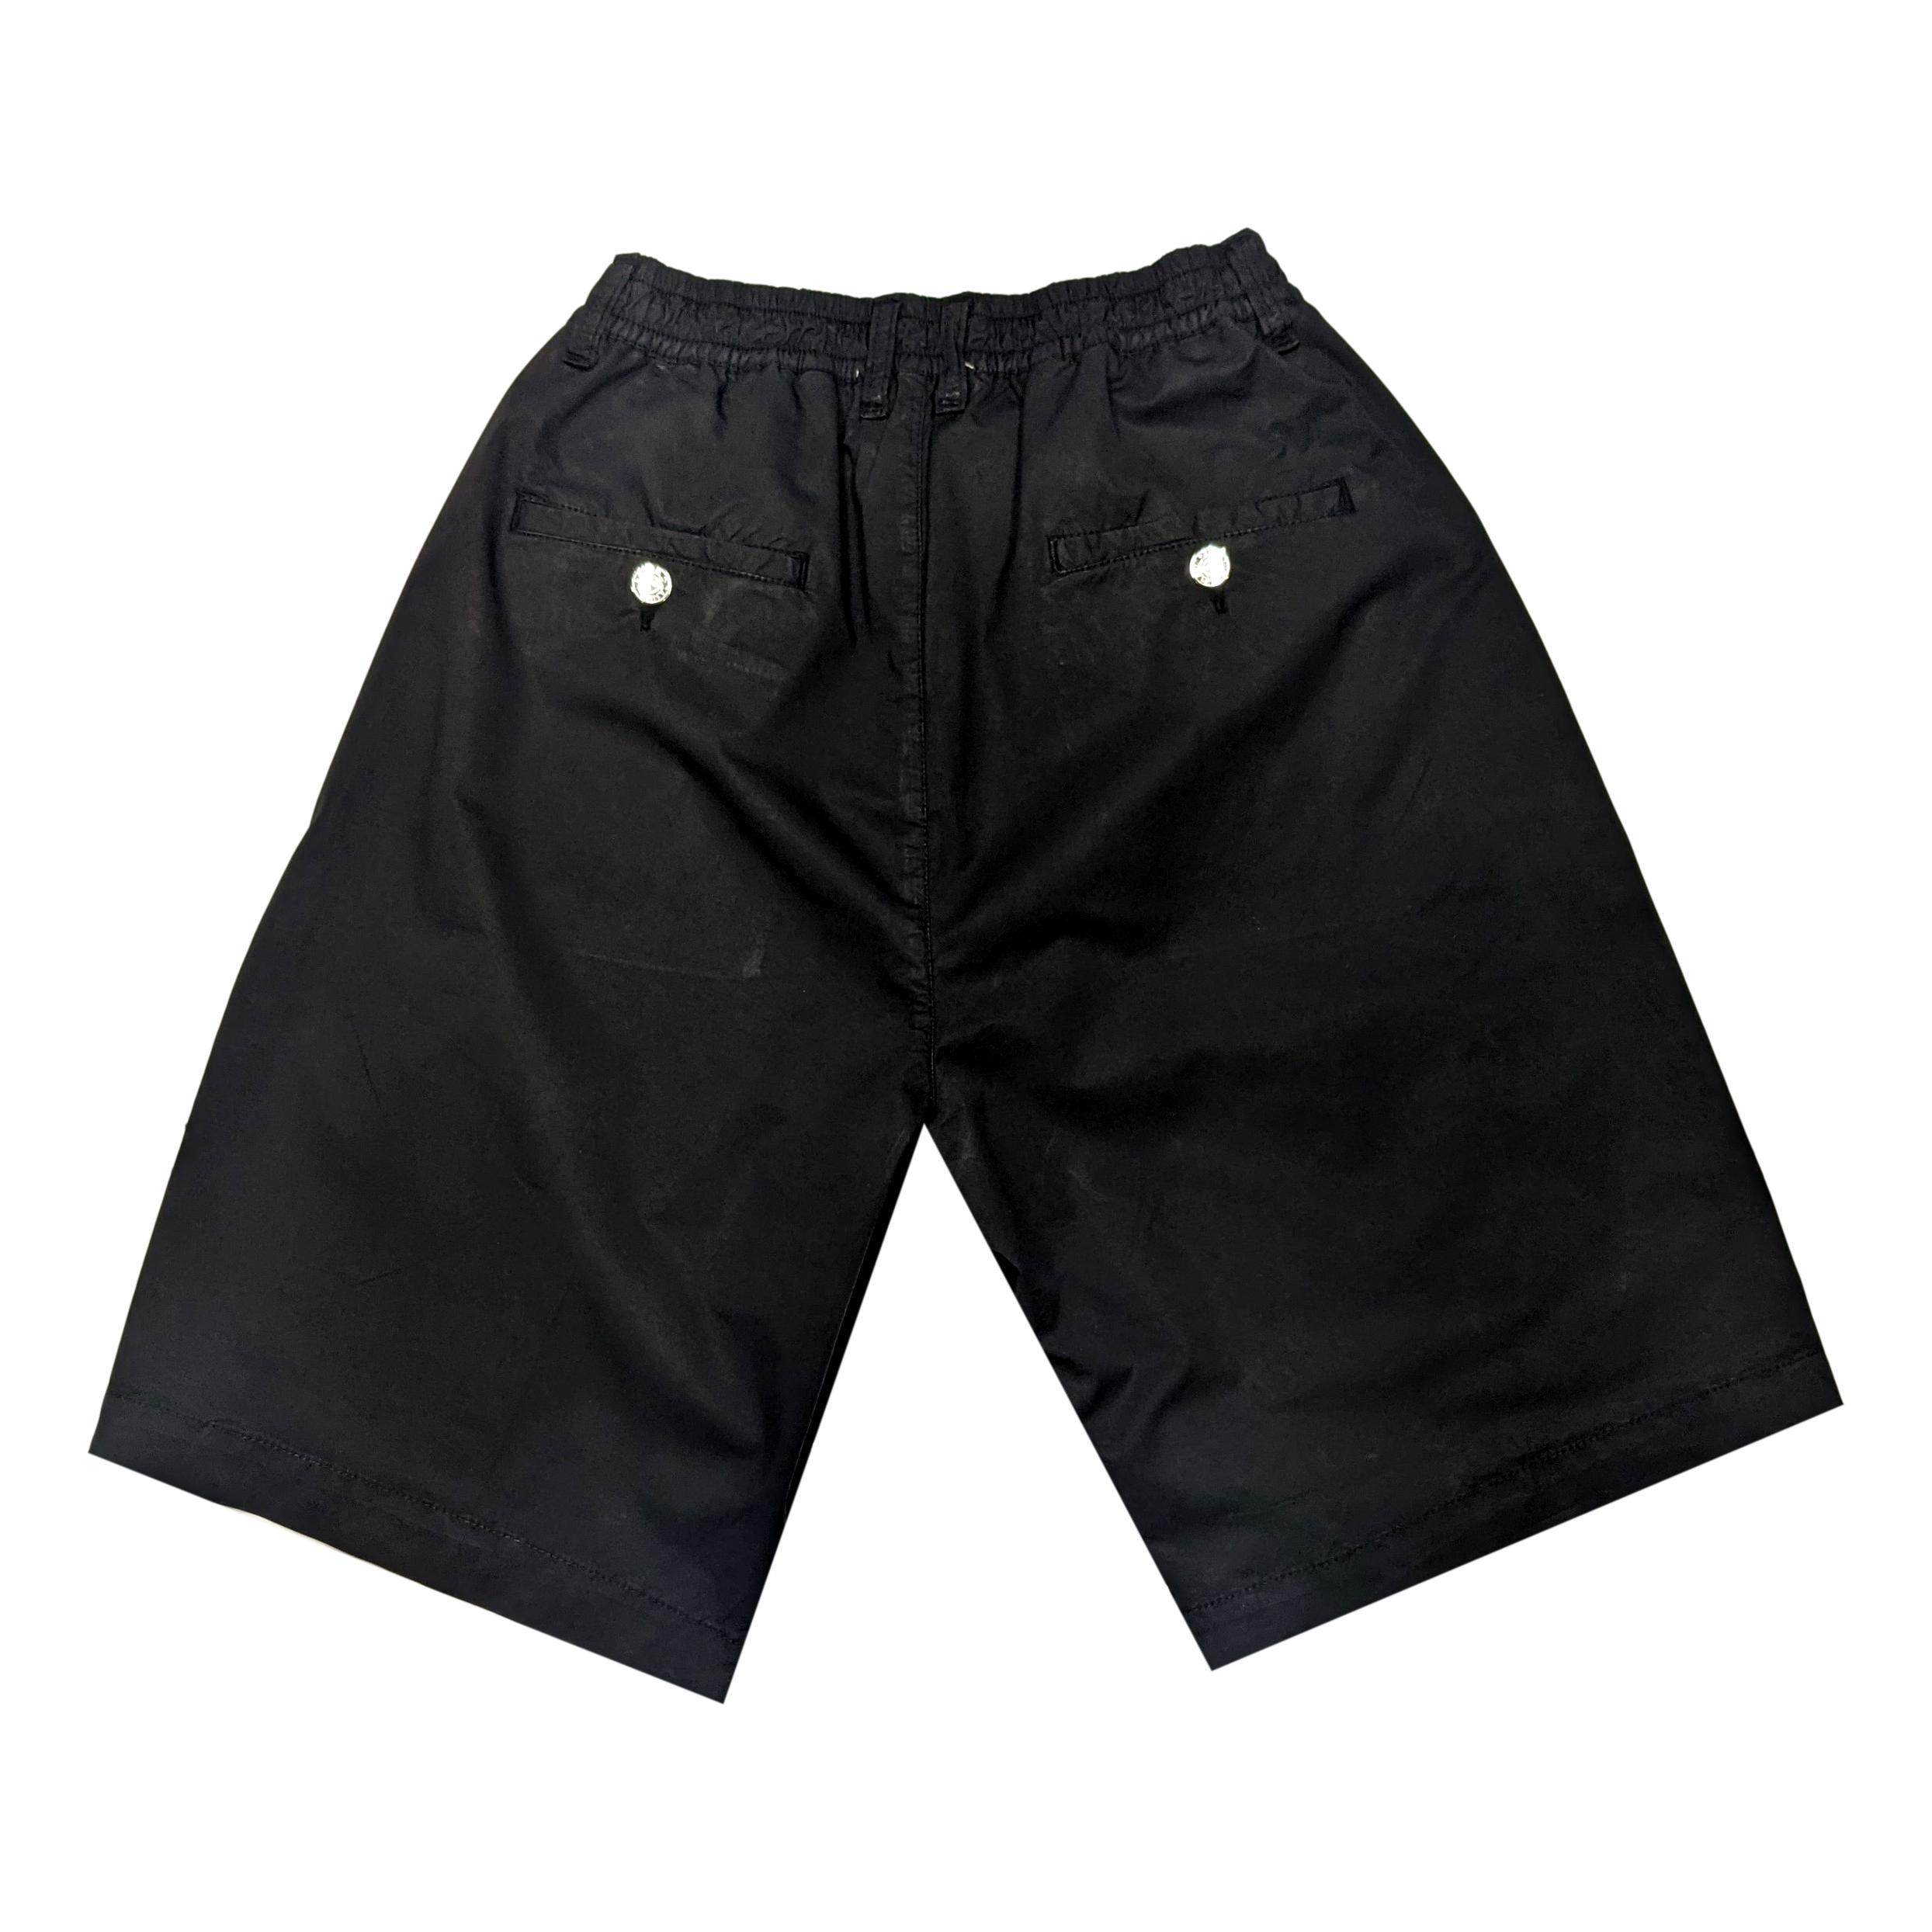 Short with pence DANILO PAURA      05DP5018M06090